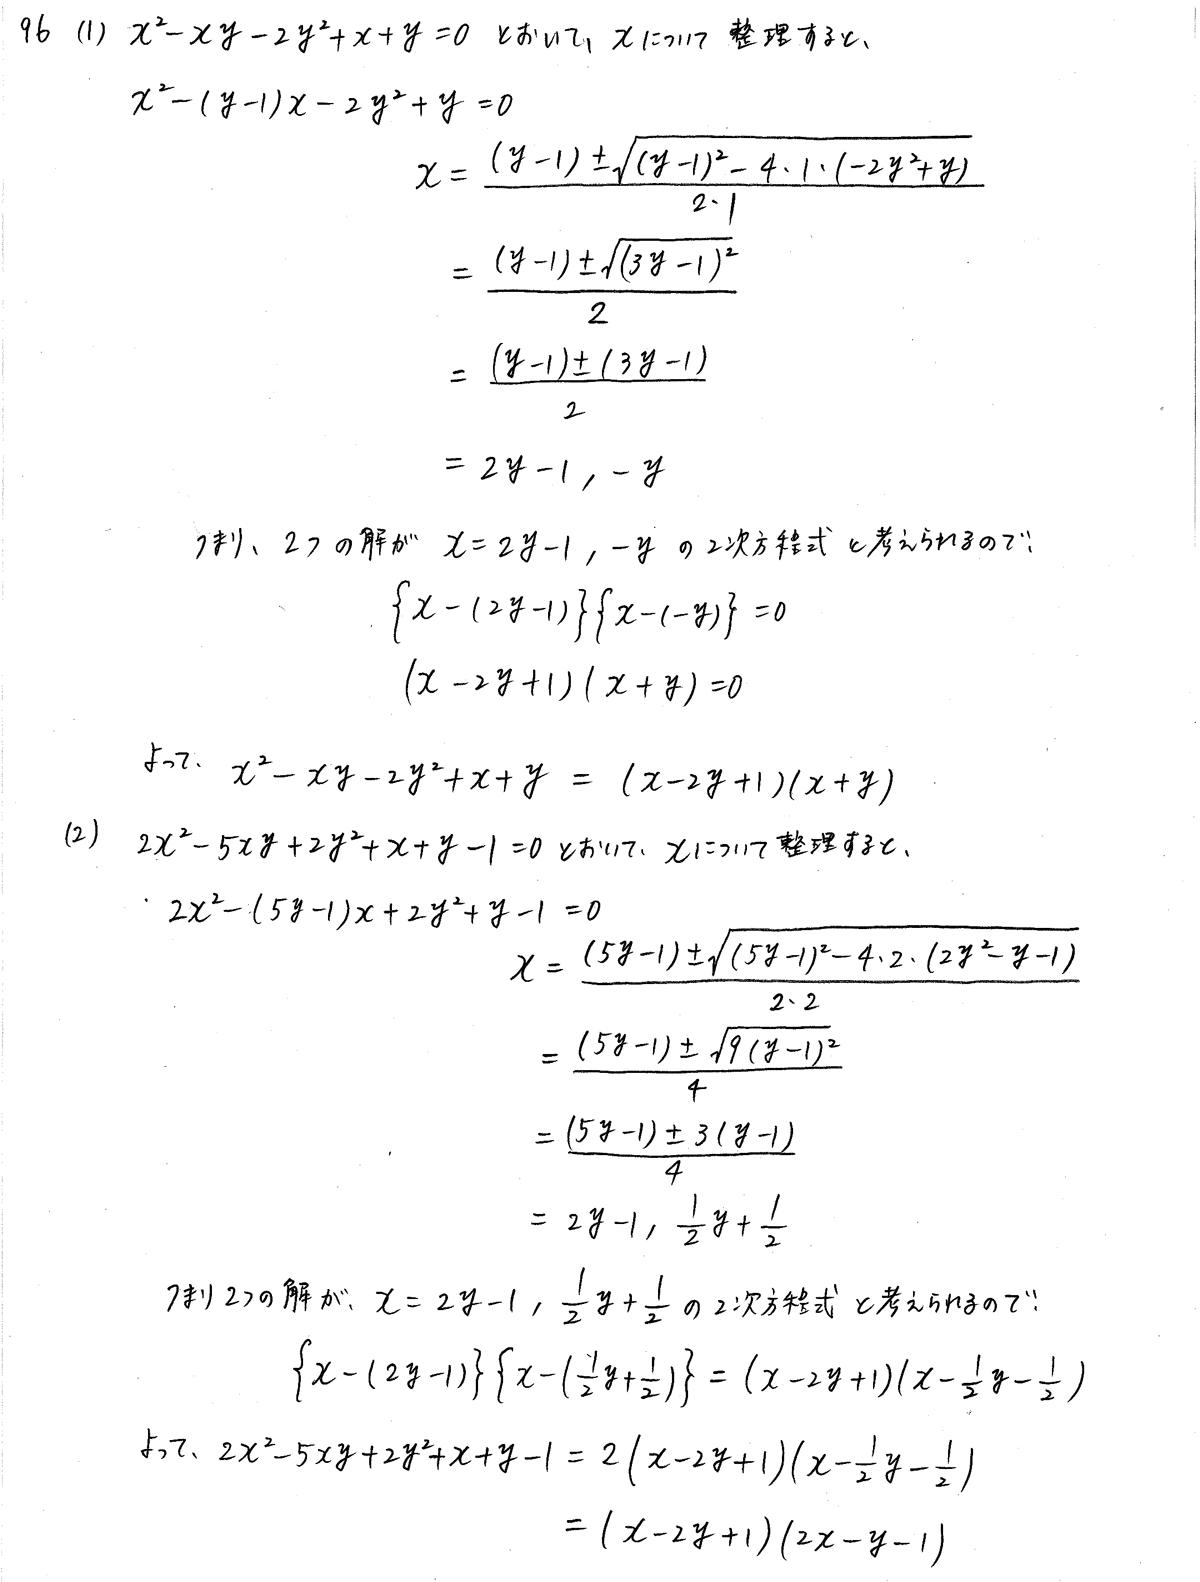 3TRIAL数学2-96解答